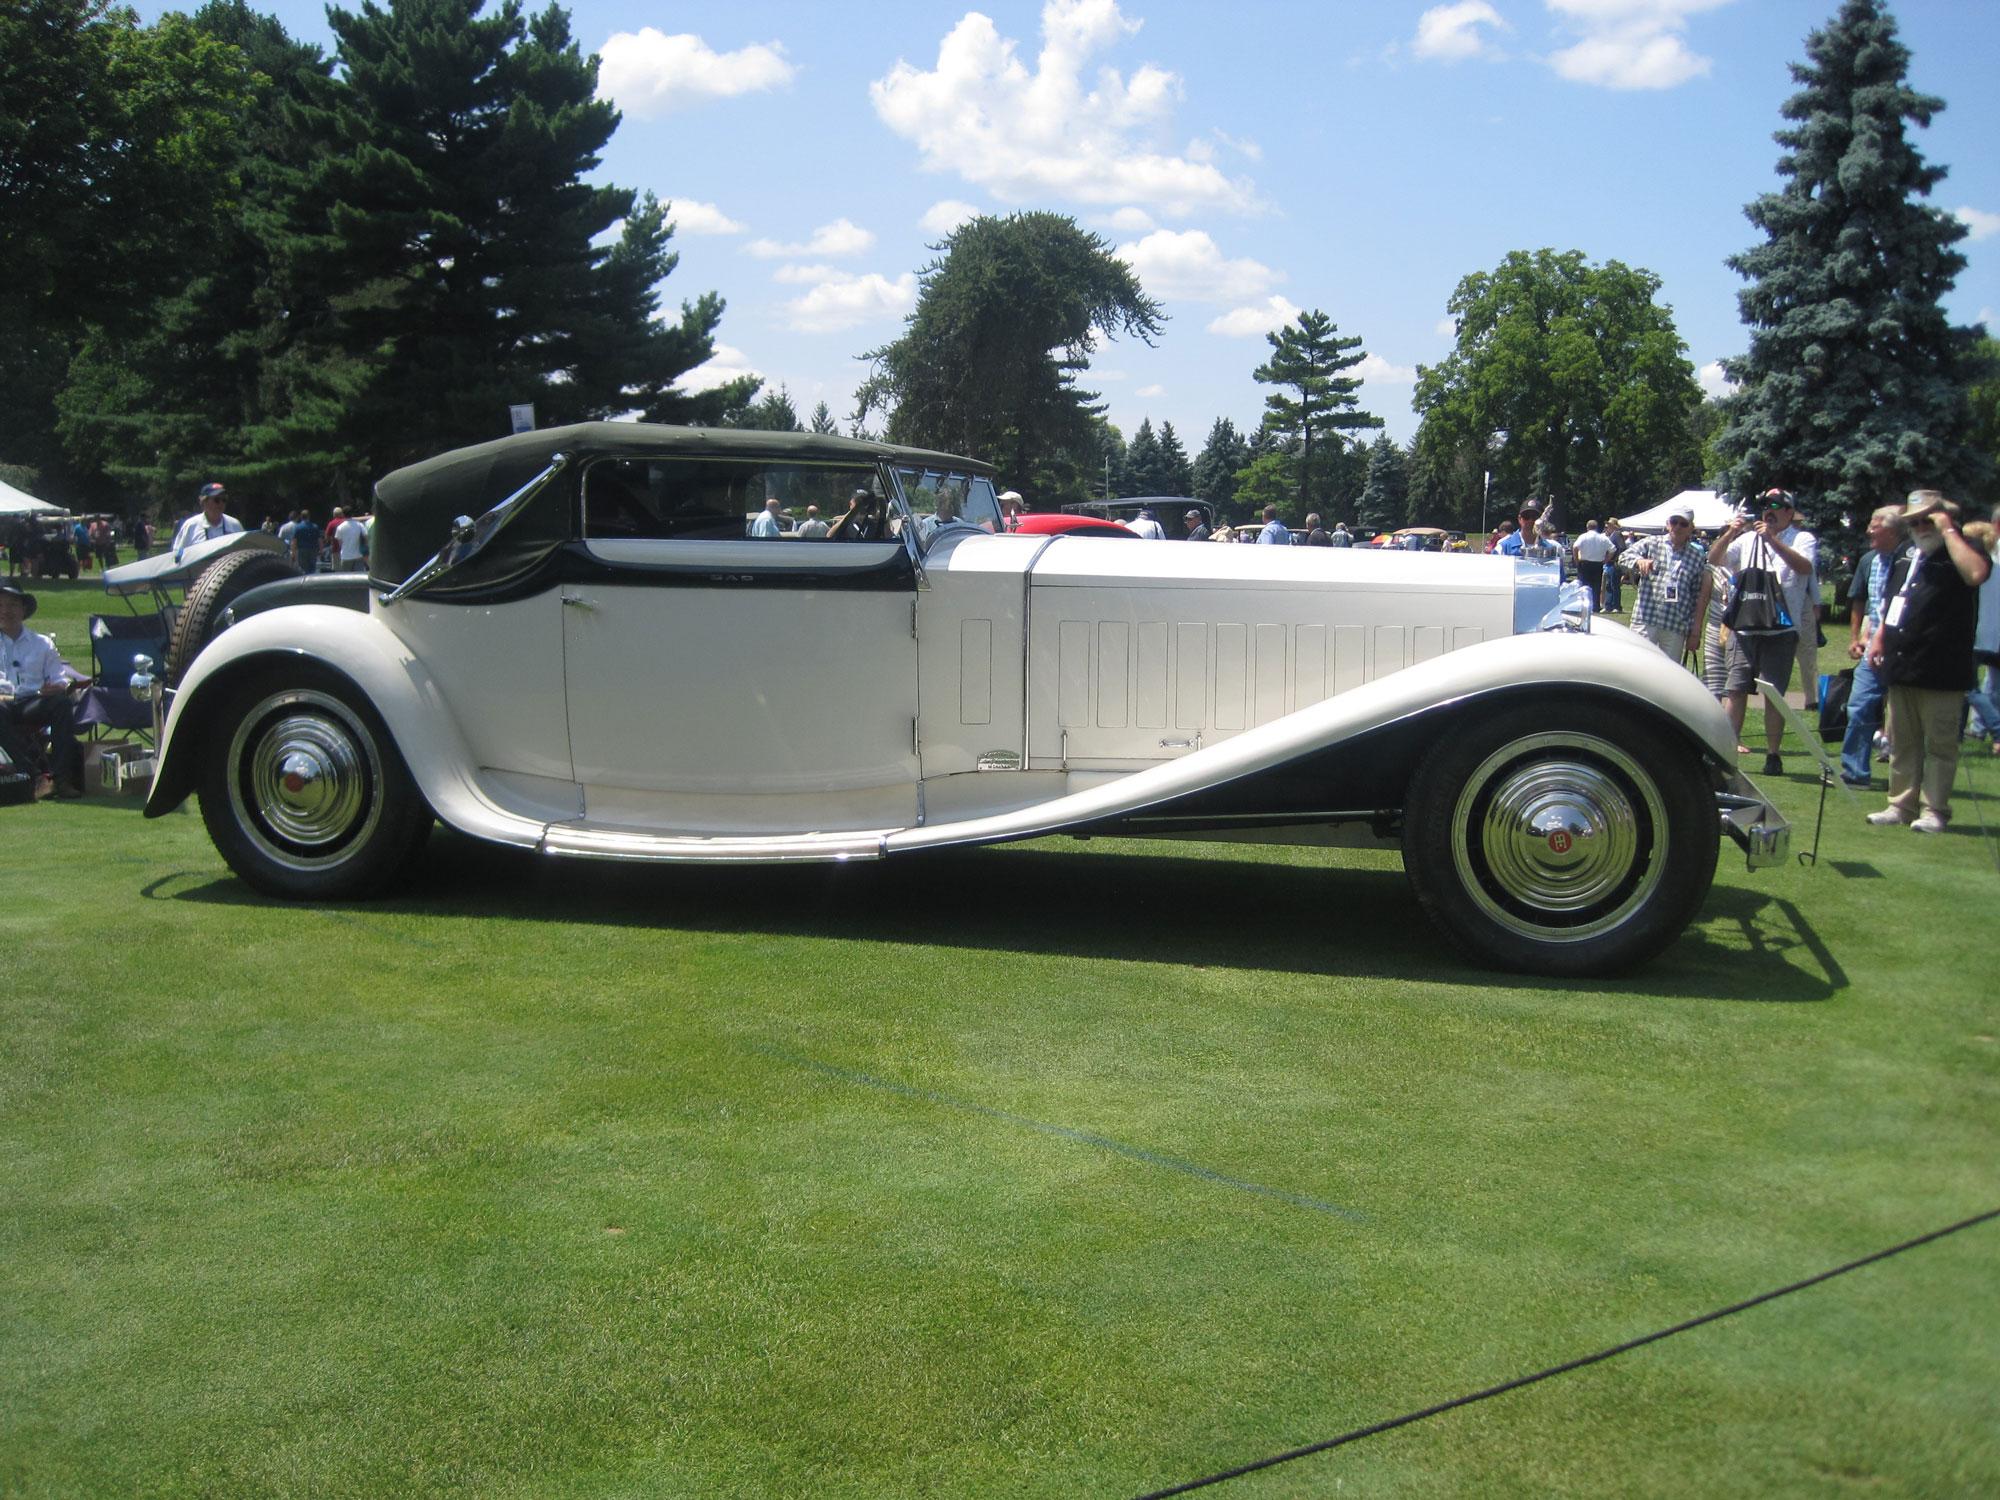 Bugatti Royale side profile